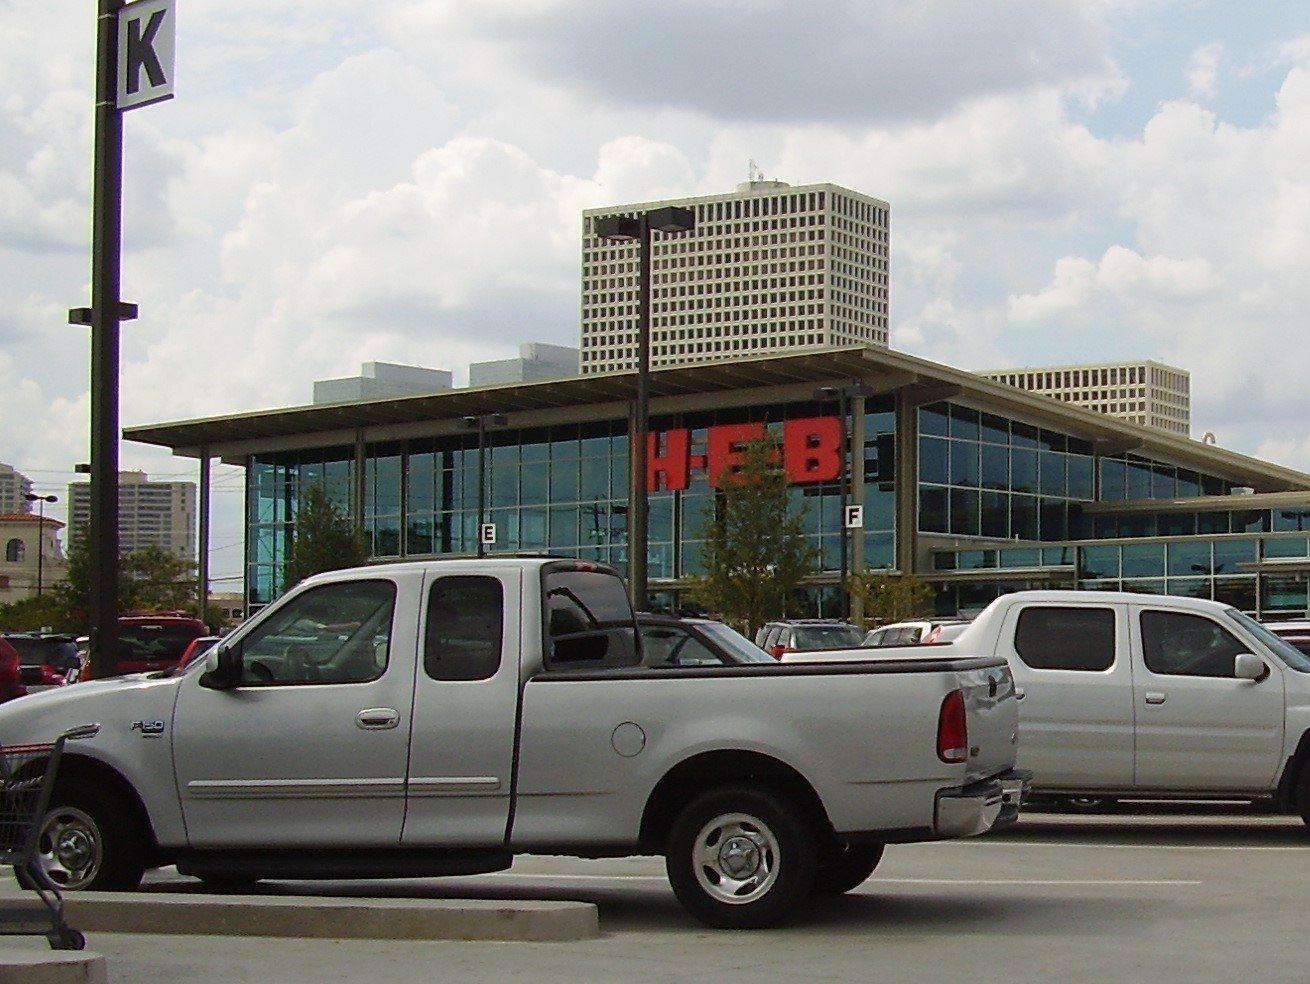 H-E-B Market